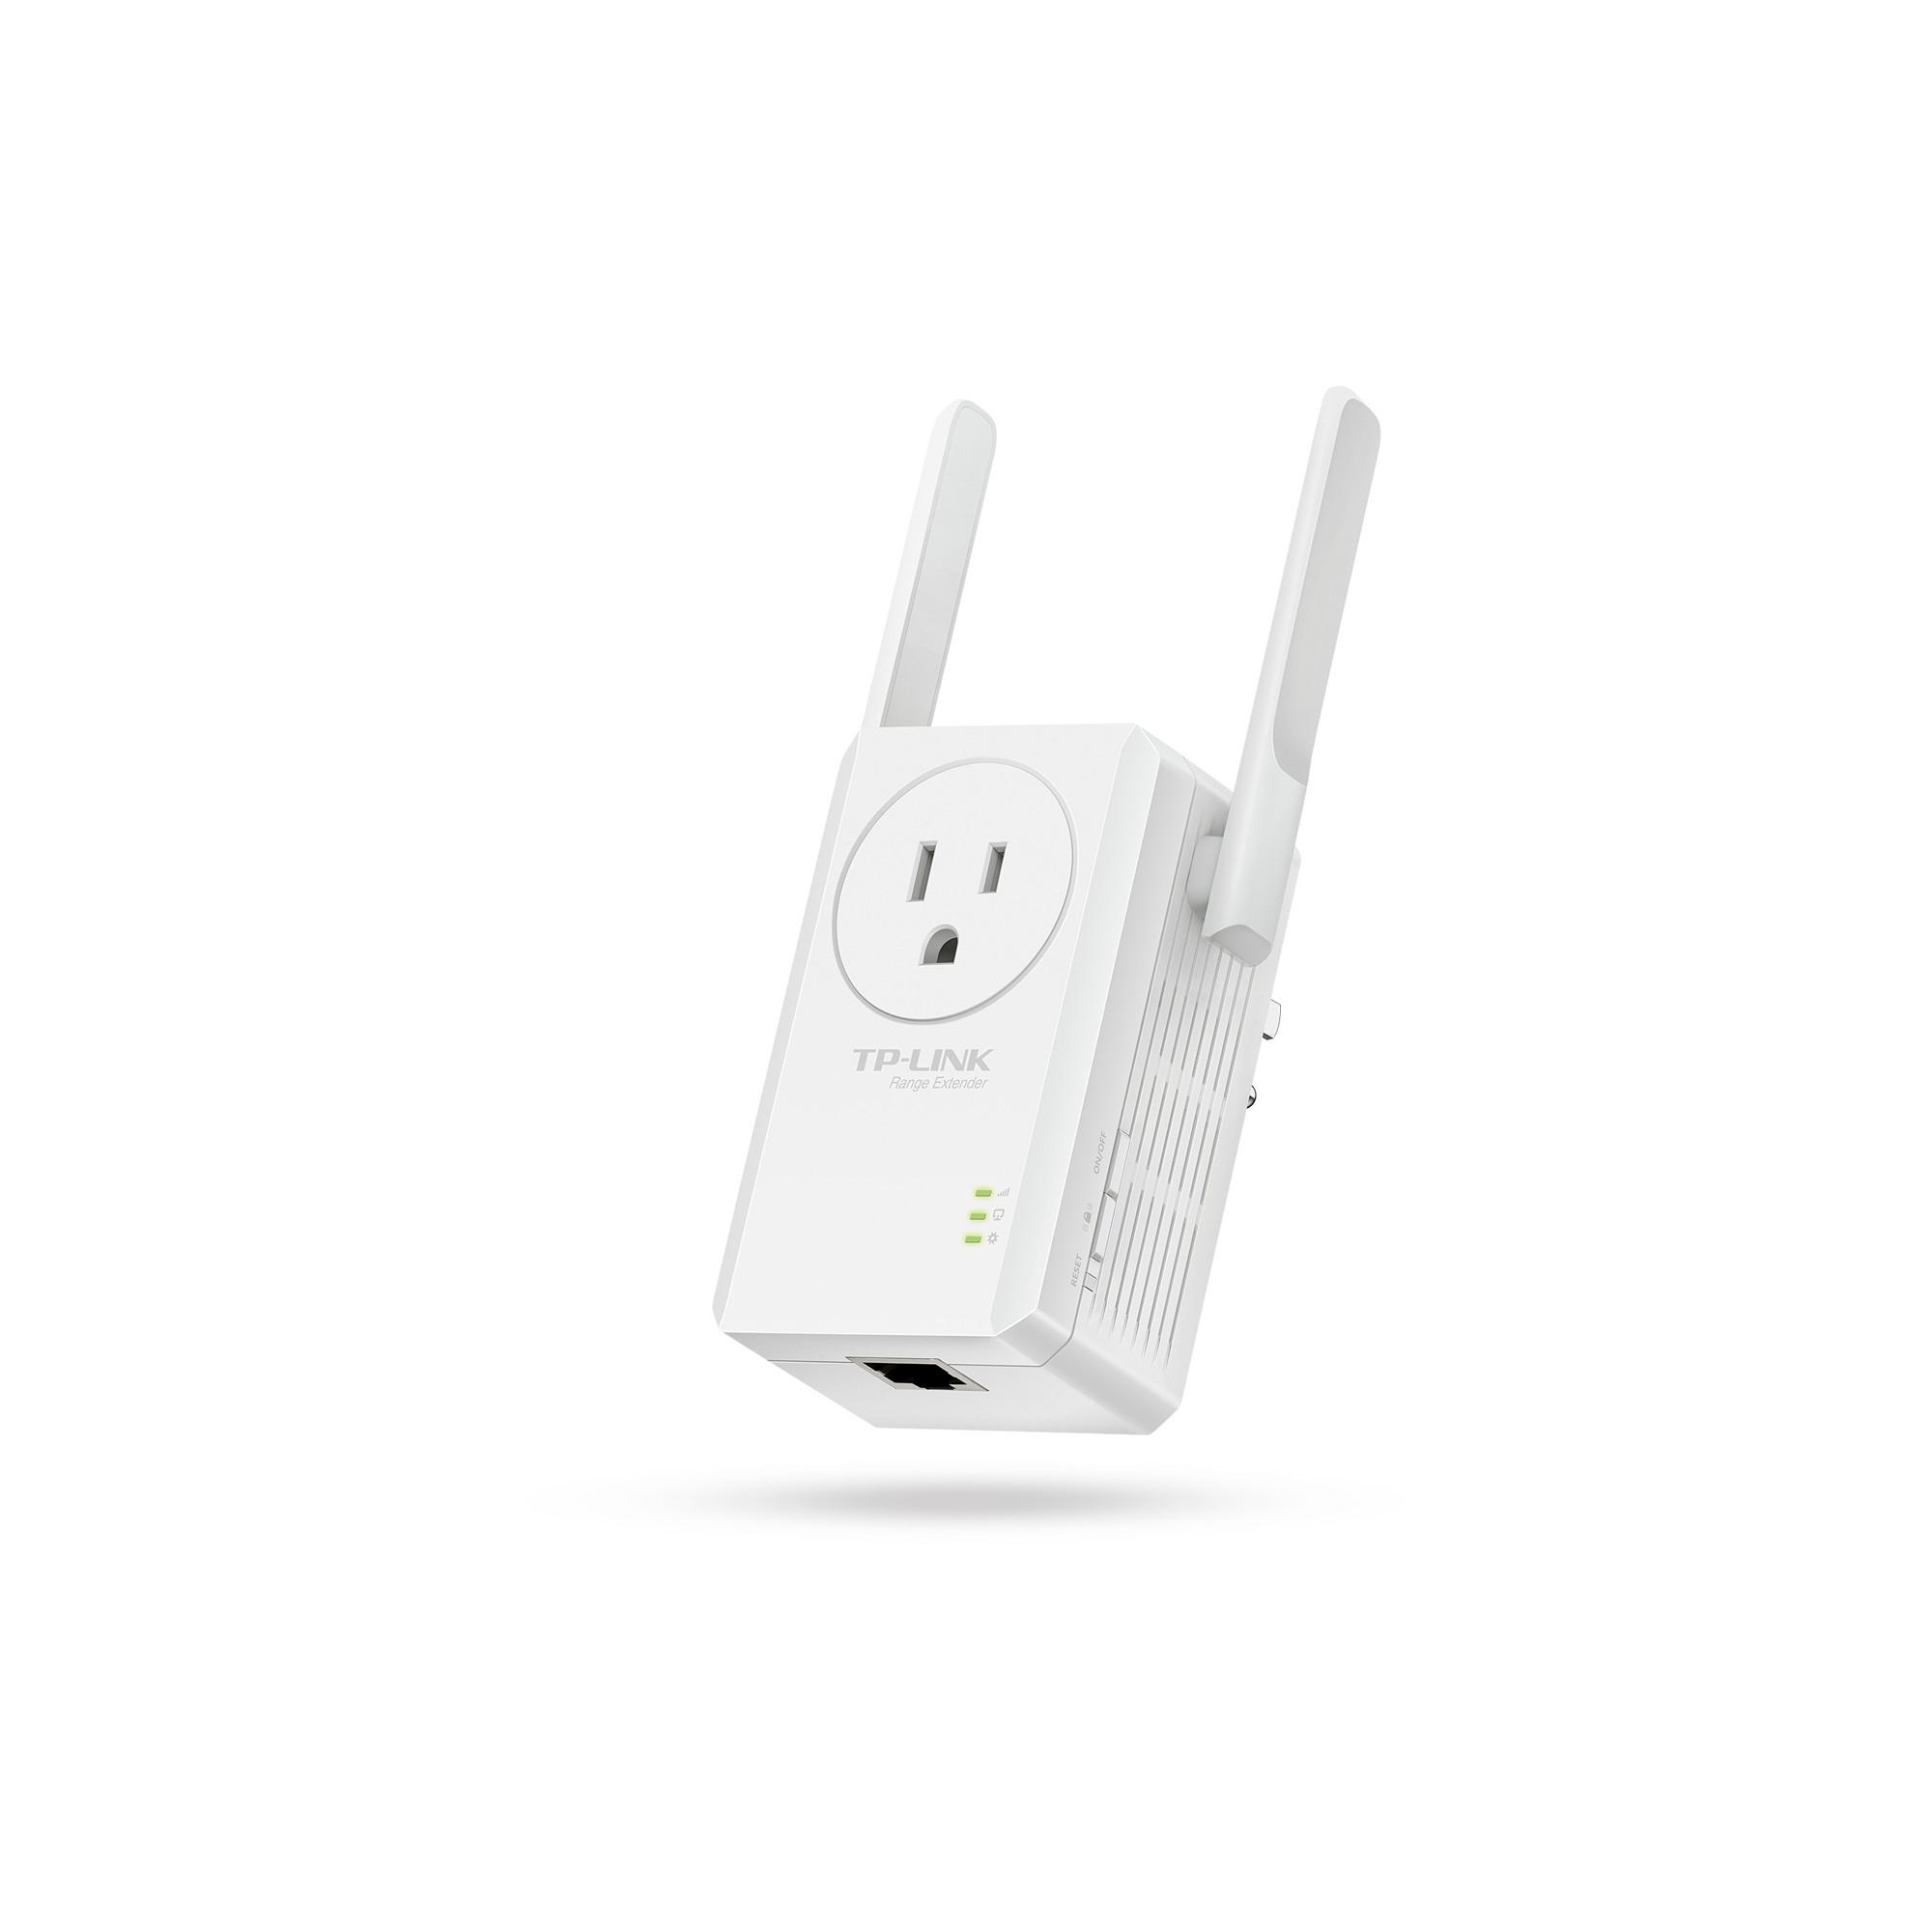 TP-Link N300 Universal Wi-Fi Plug In Range Extender - White